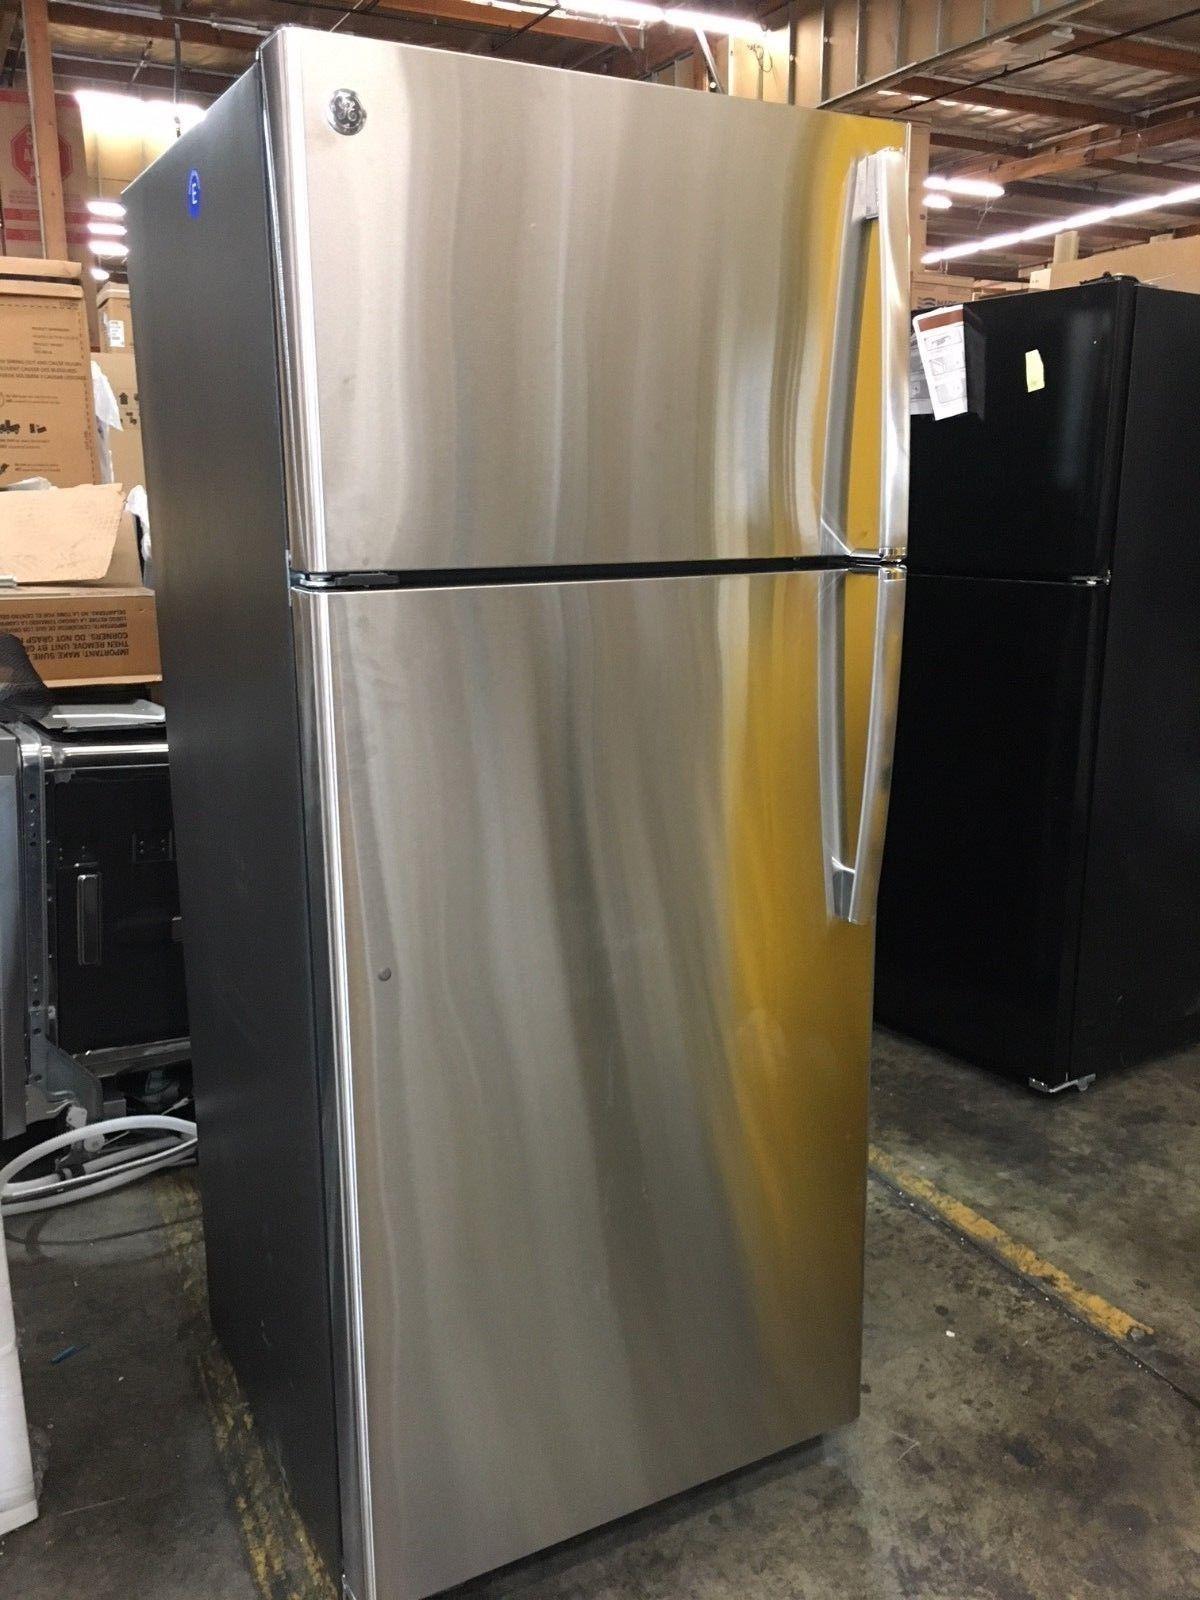 Pin On Major Appliances